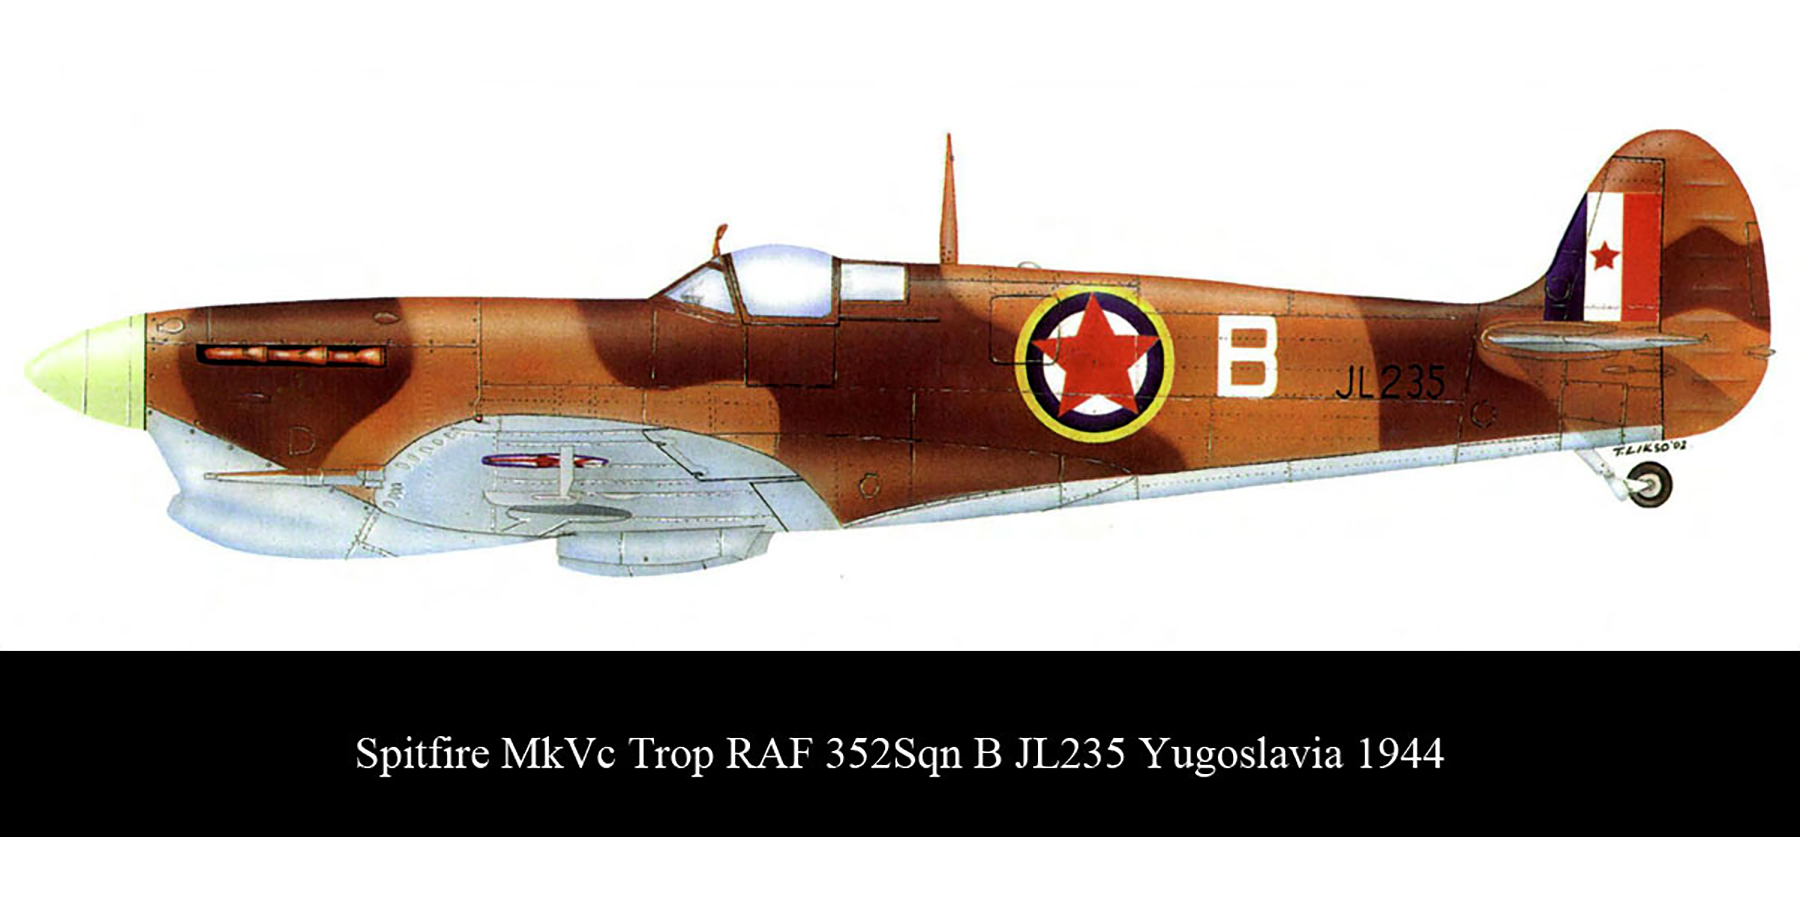 Spitfire MkVcTrop RAF 352Sqn B JL235 Yugoslavia 1944 0A